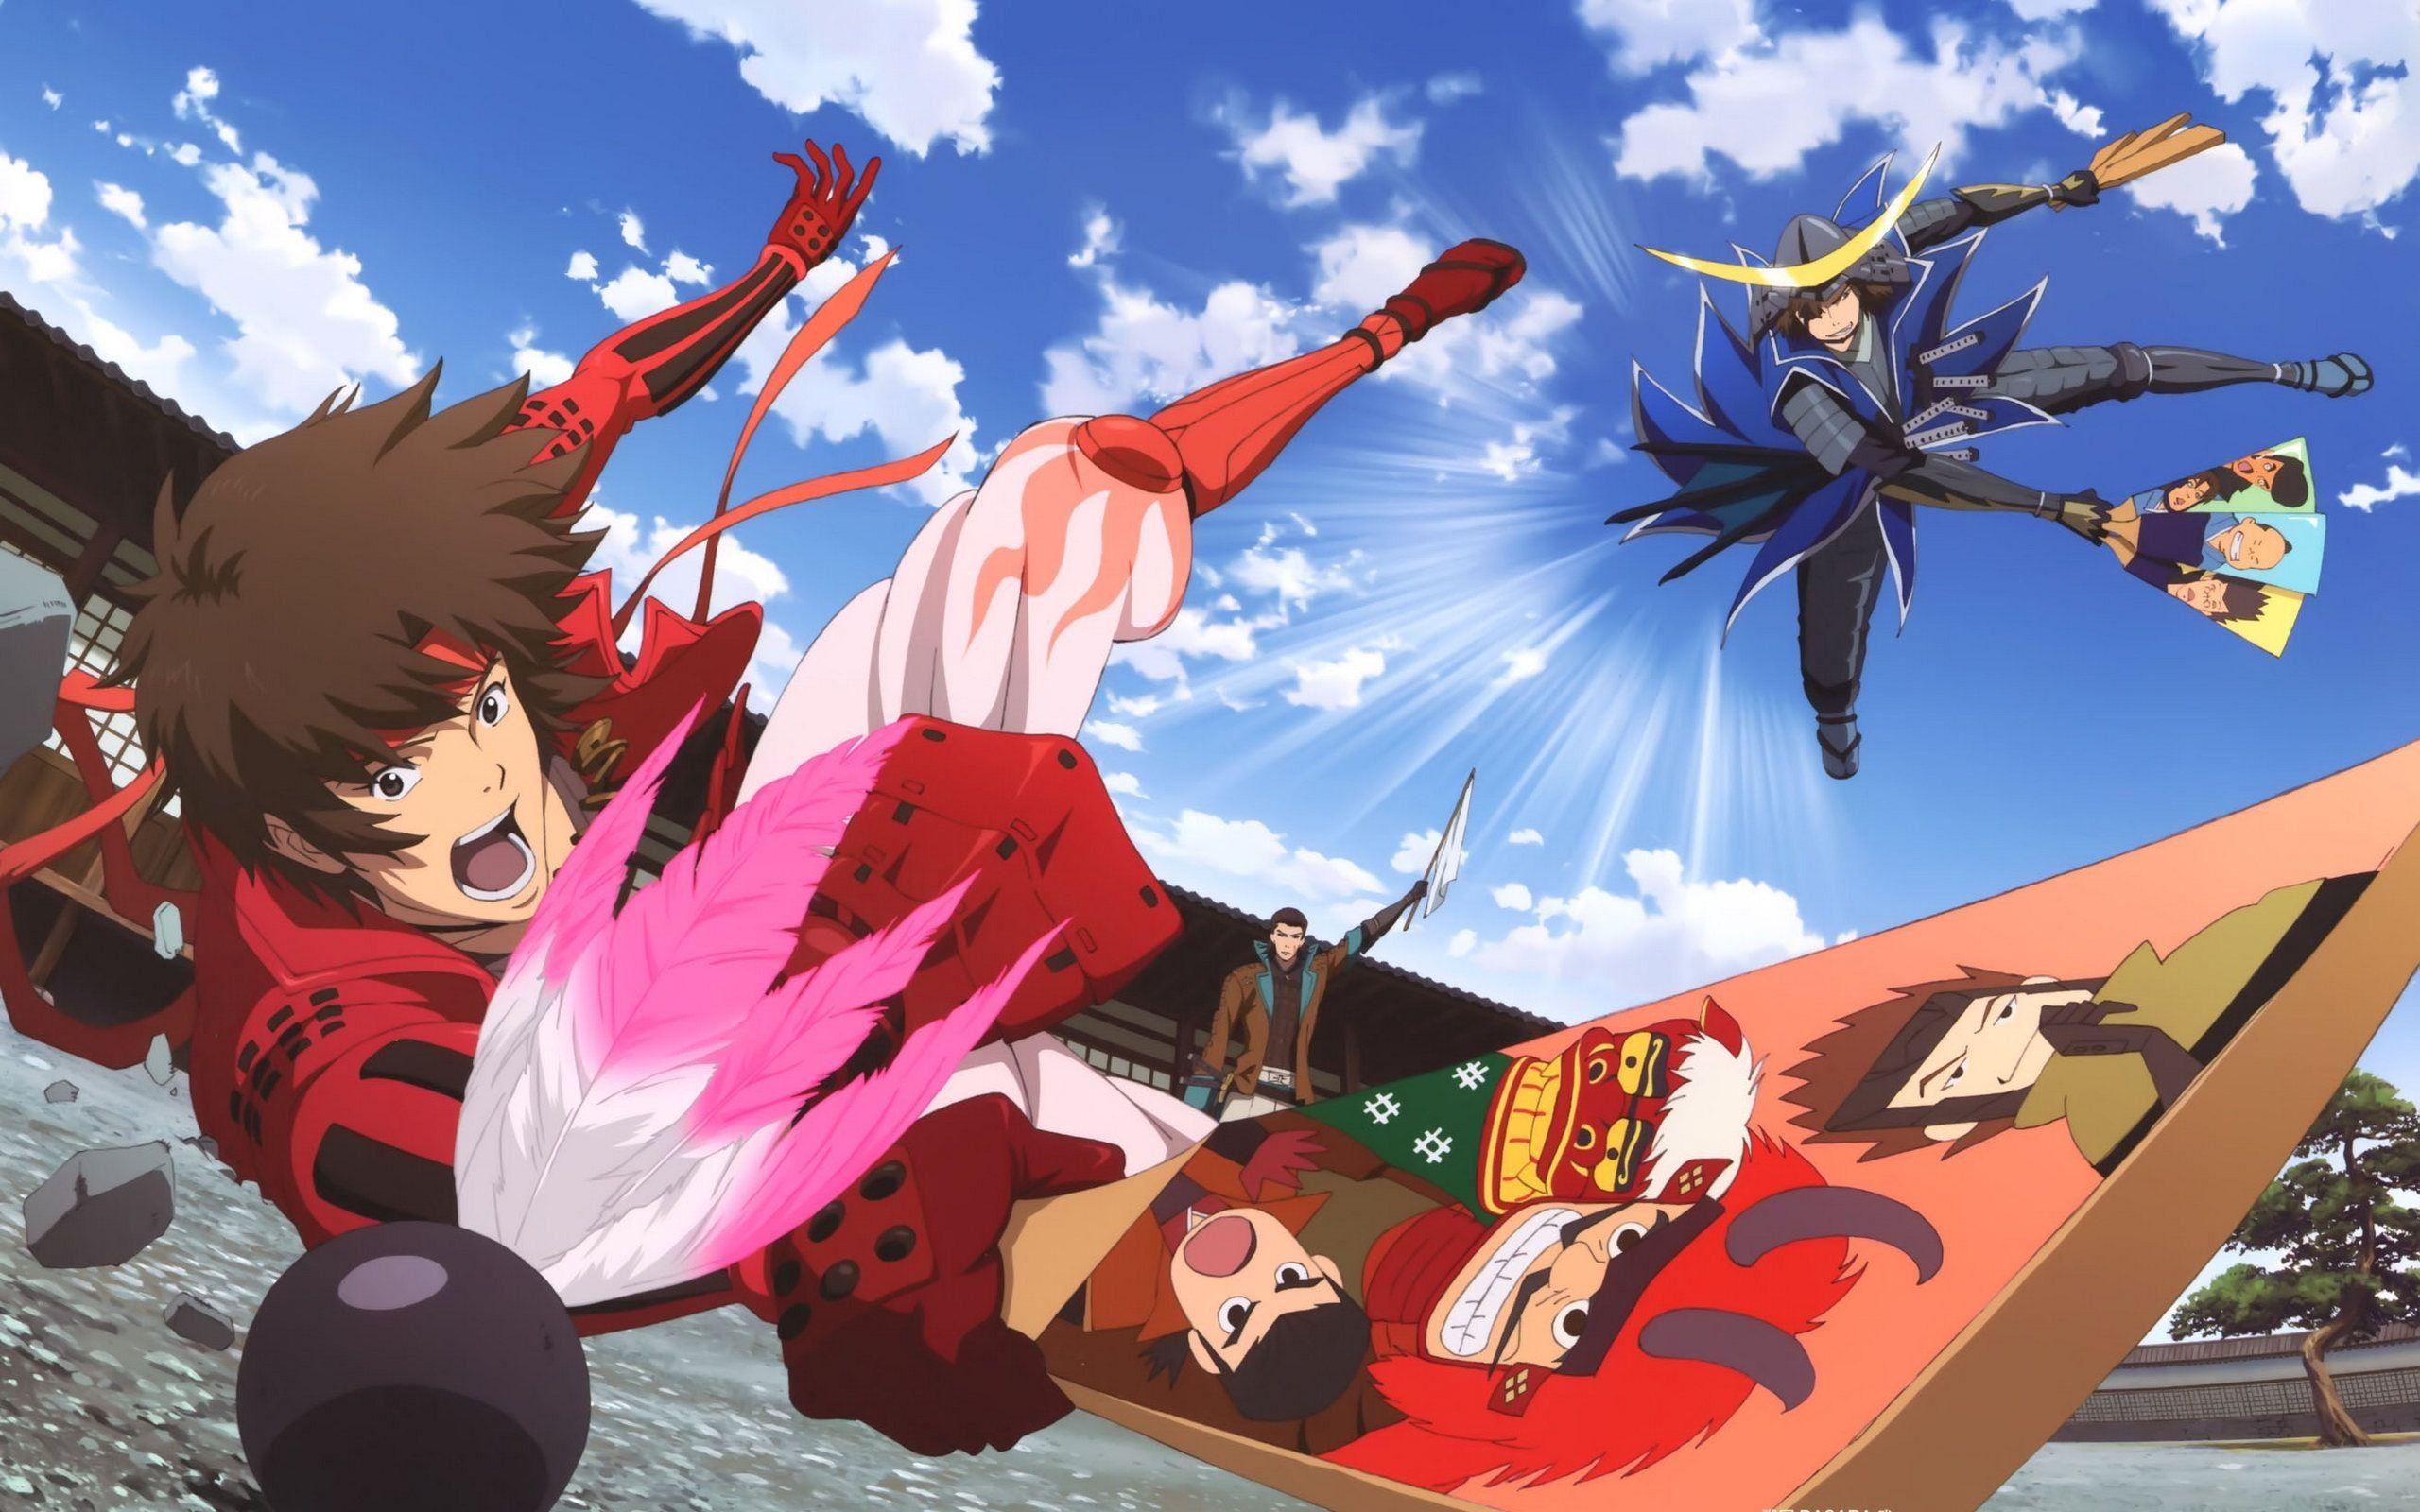 Sengoku Basara, 2 - HD Wallpaper. ImgPrix.com - High Definition Wallpapers  and Covers | Basara, Sengoku basara, Anime wallpaper